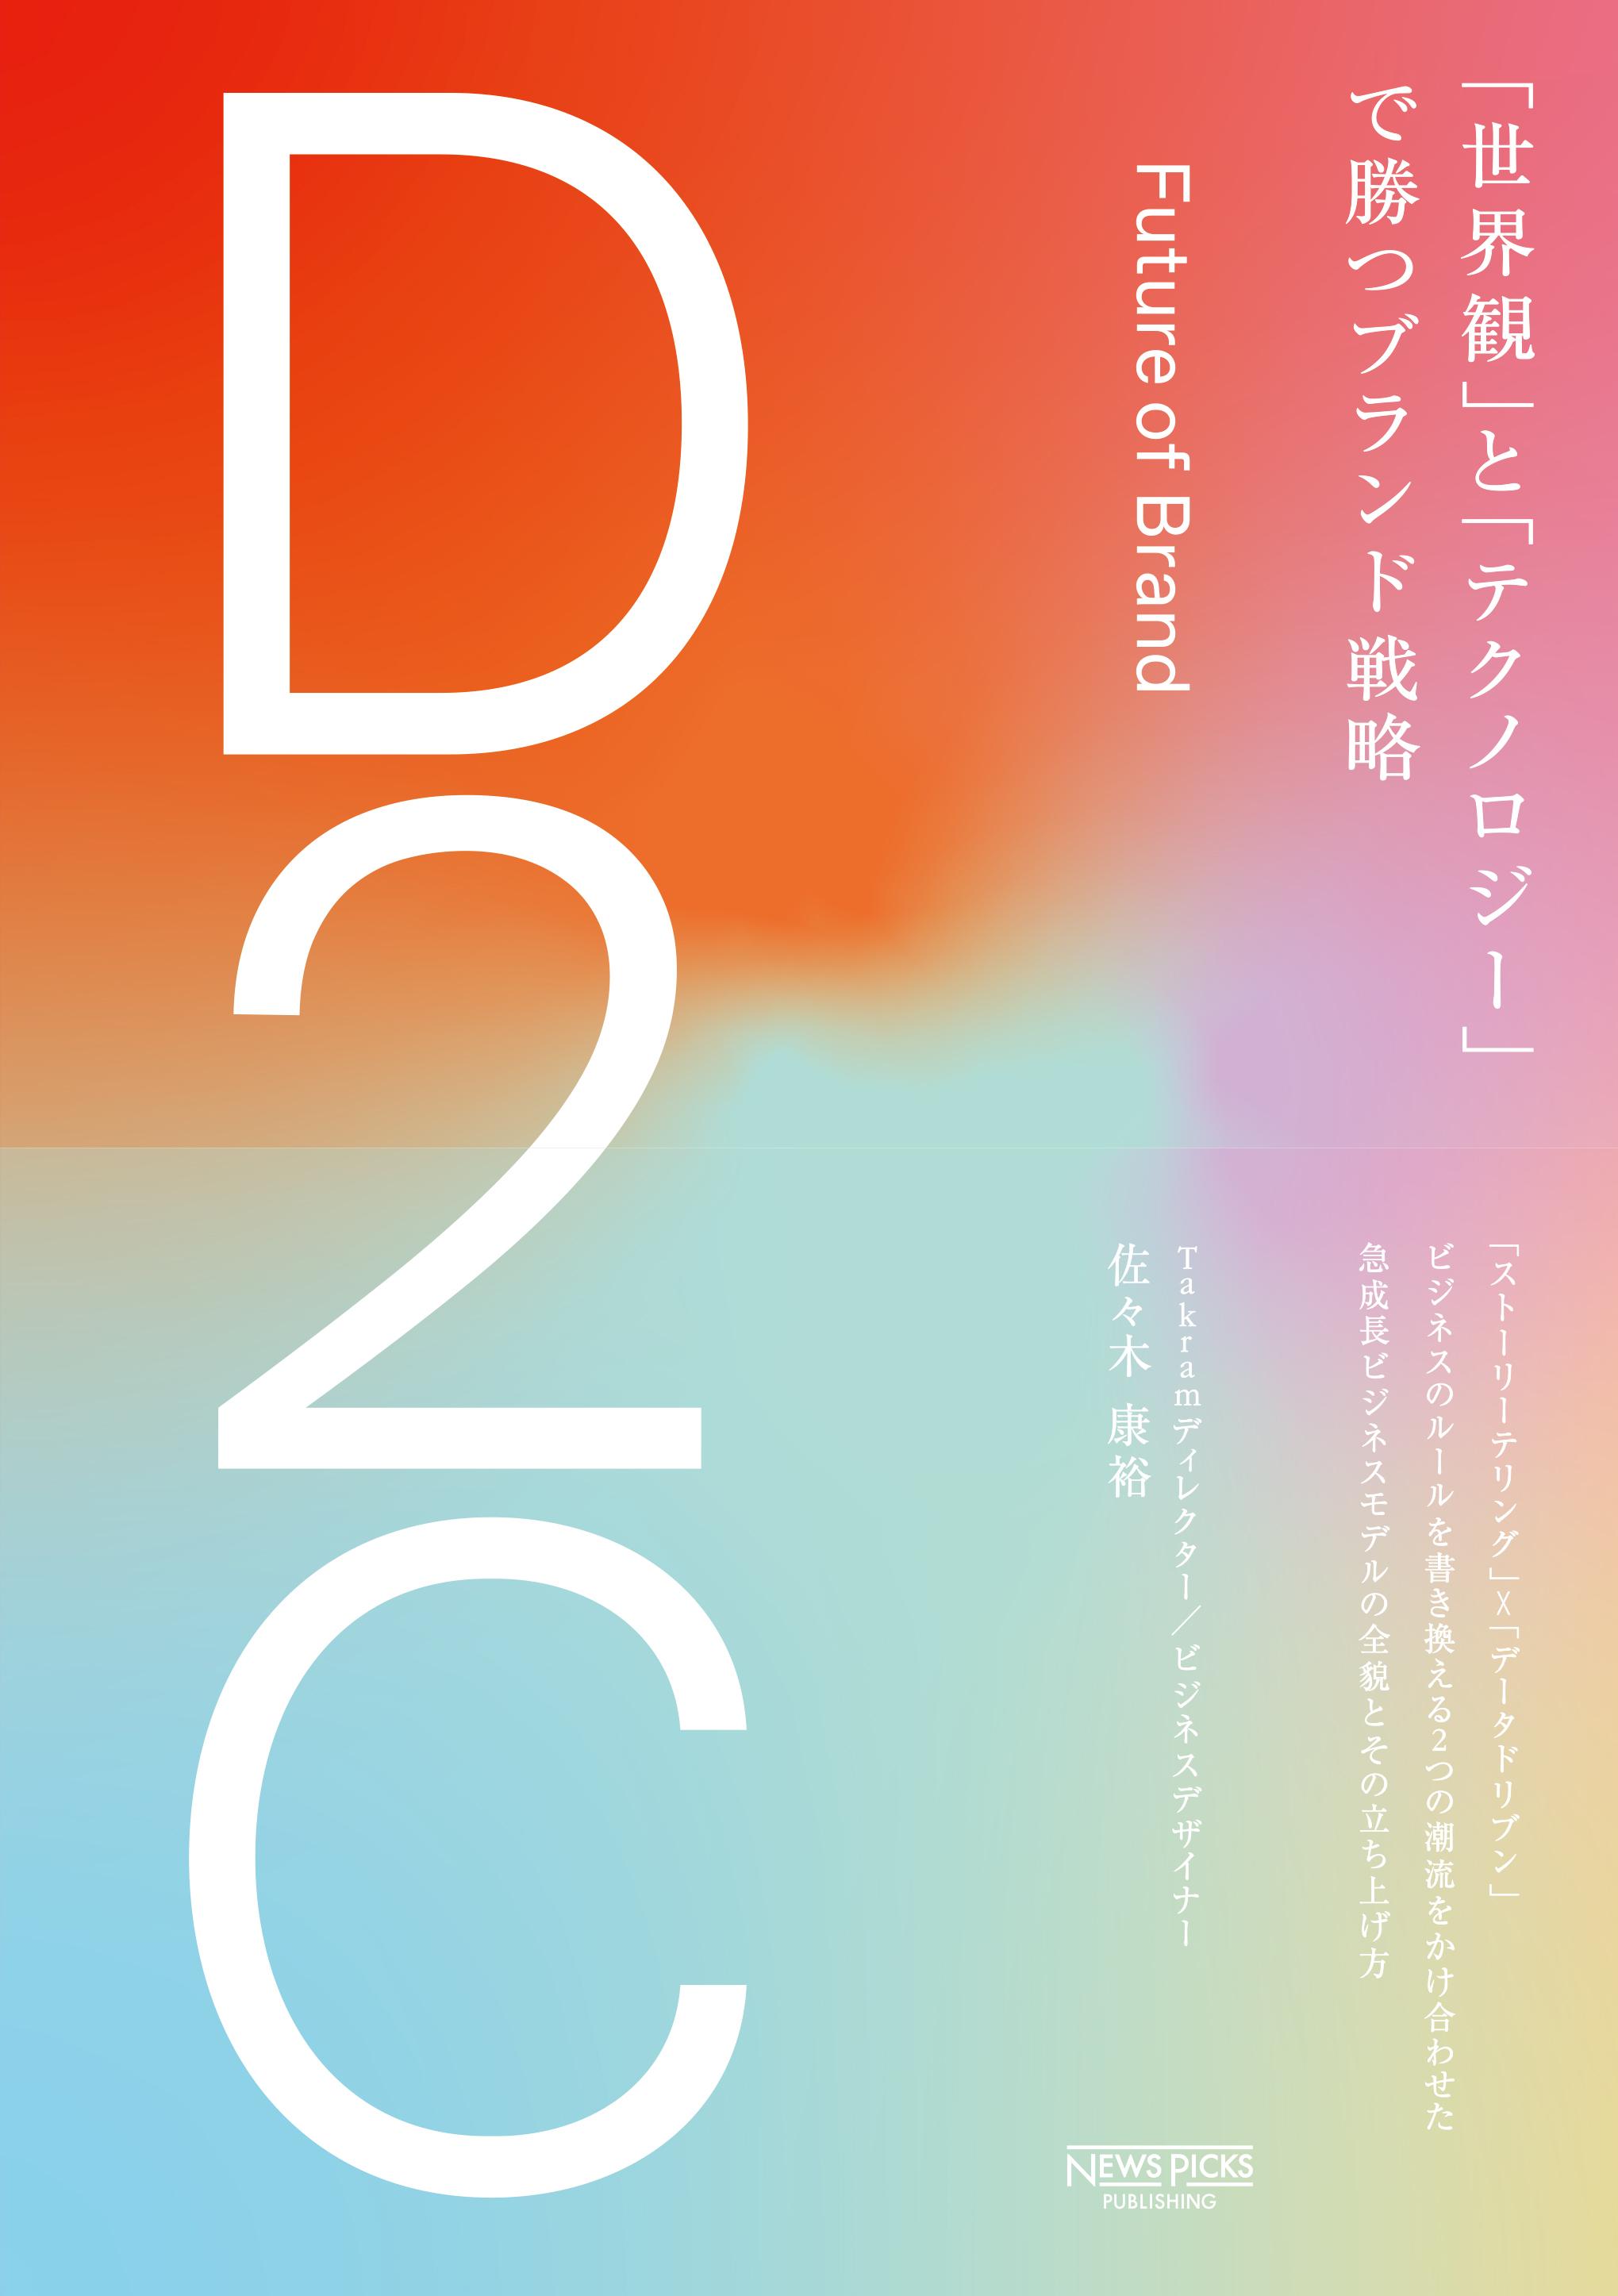 D2C--「世界観」と「ストーリーテリング」で顧客を巻き込むブランド戦略